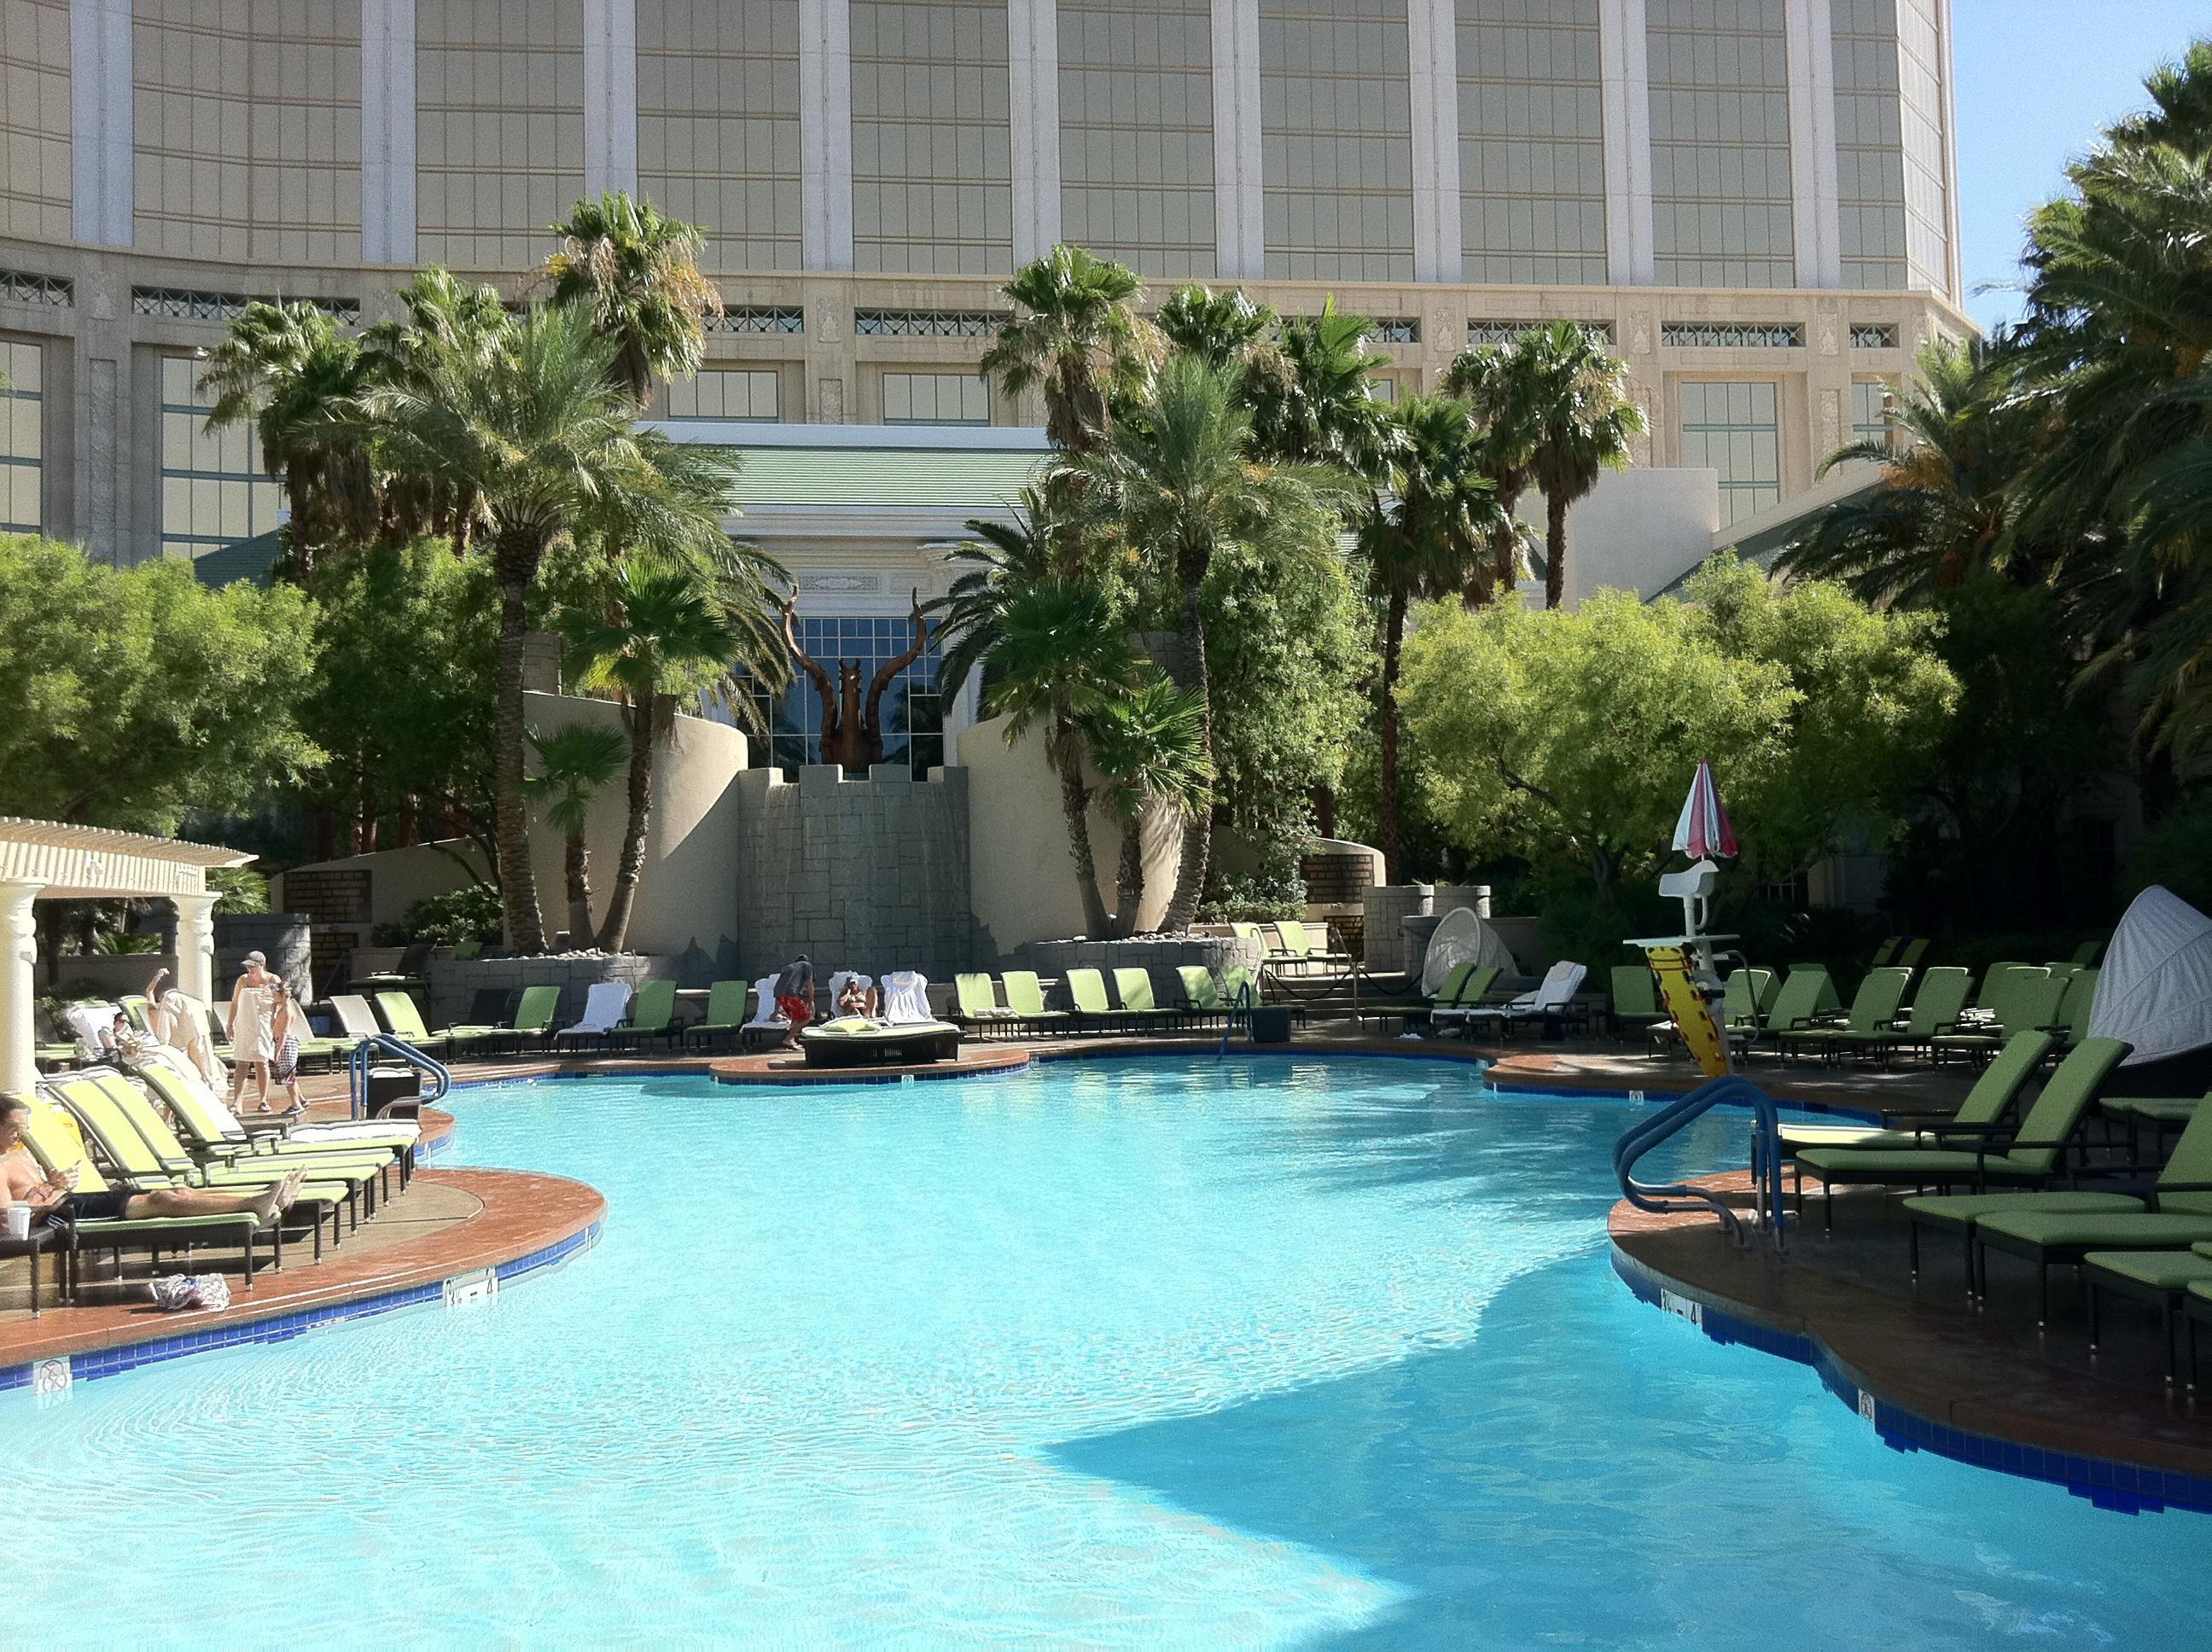 10 Kid-Friendly Hotels in Las Vegas